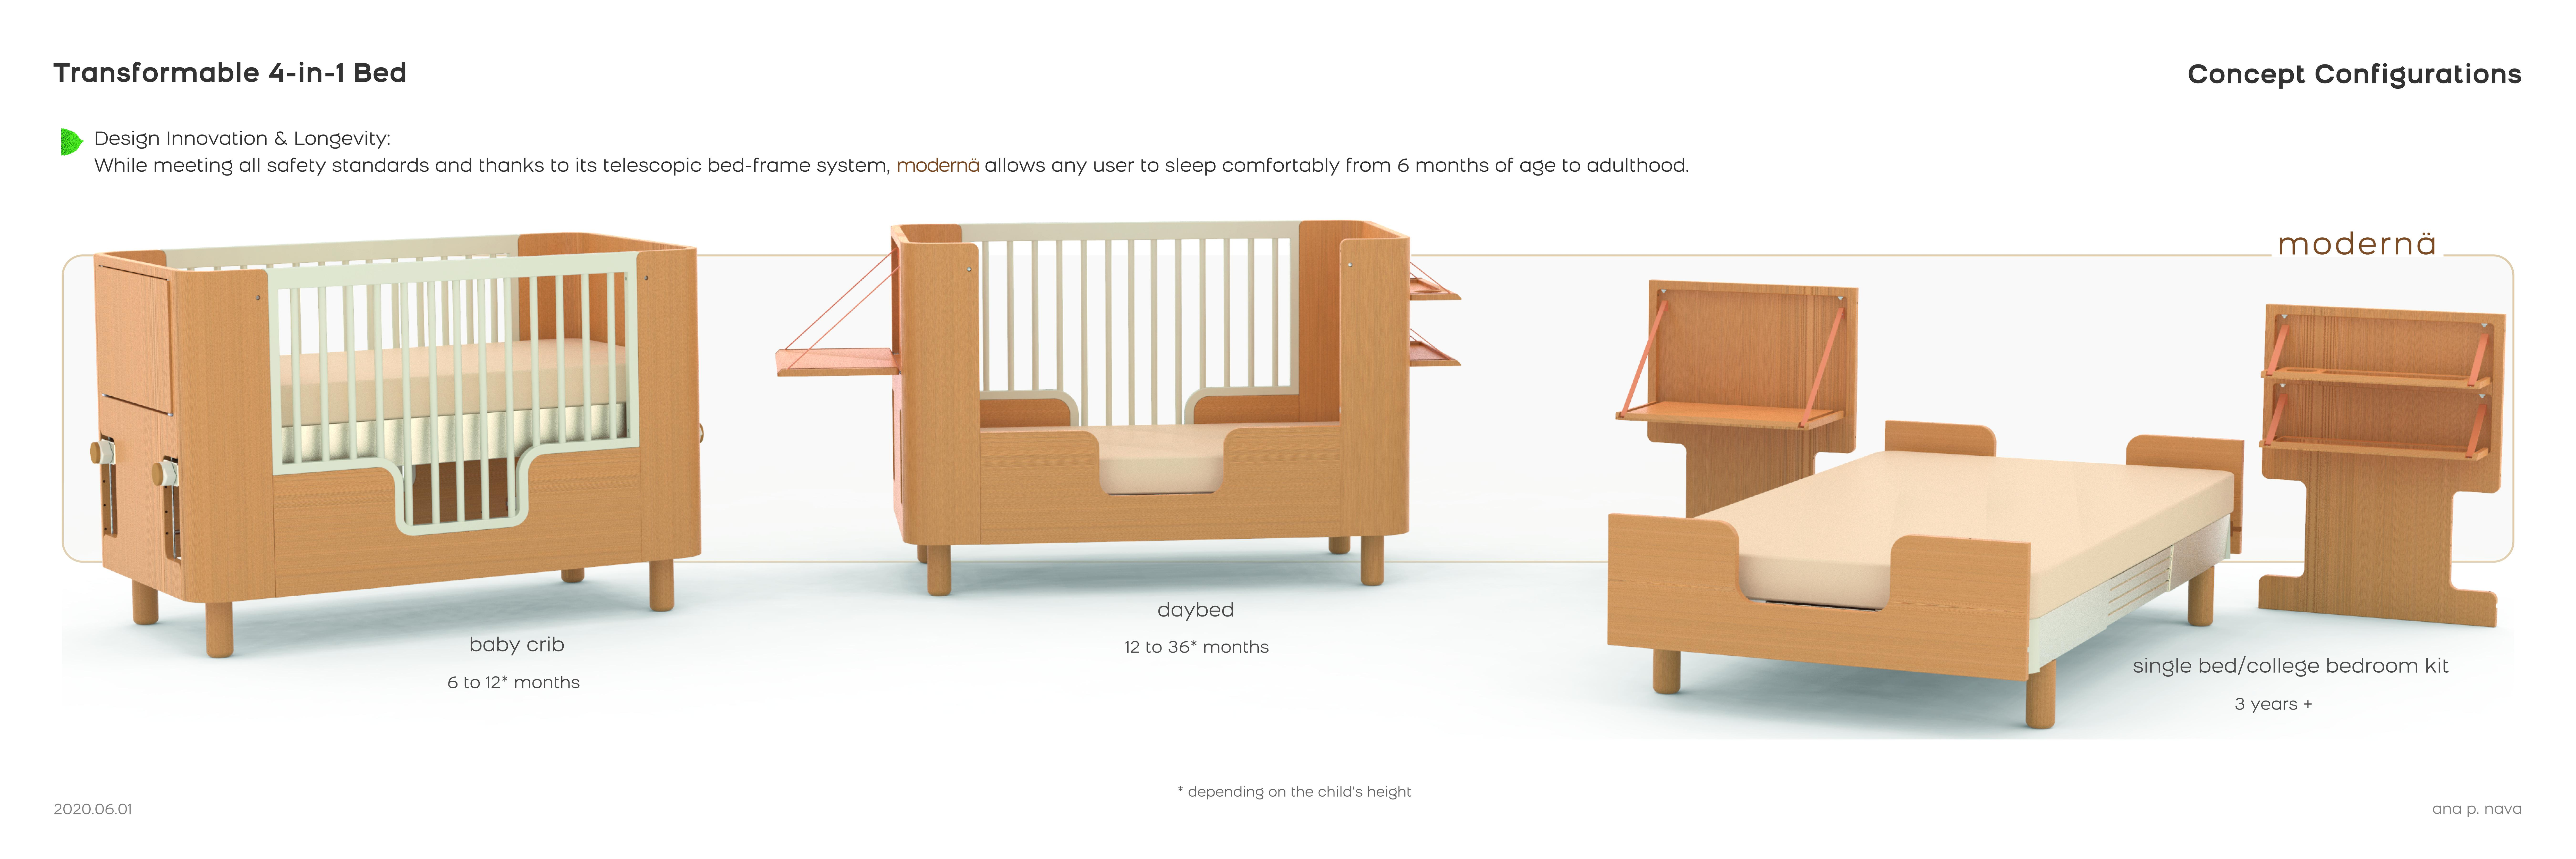 04 Concept Configurations